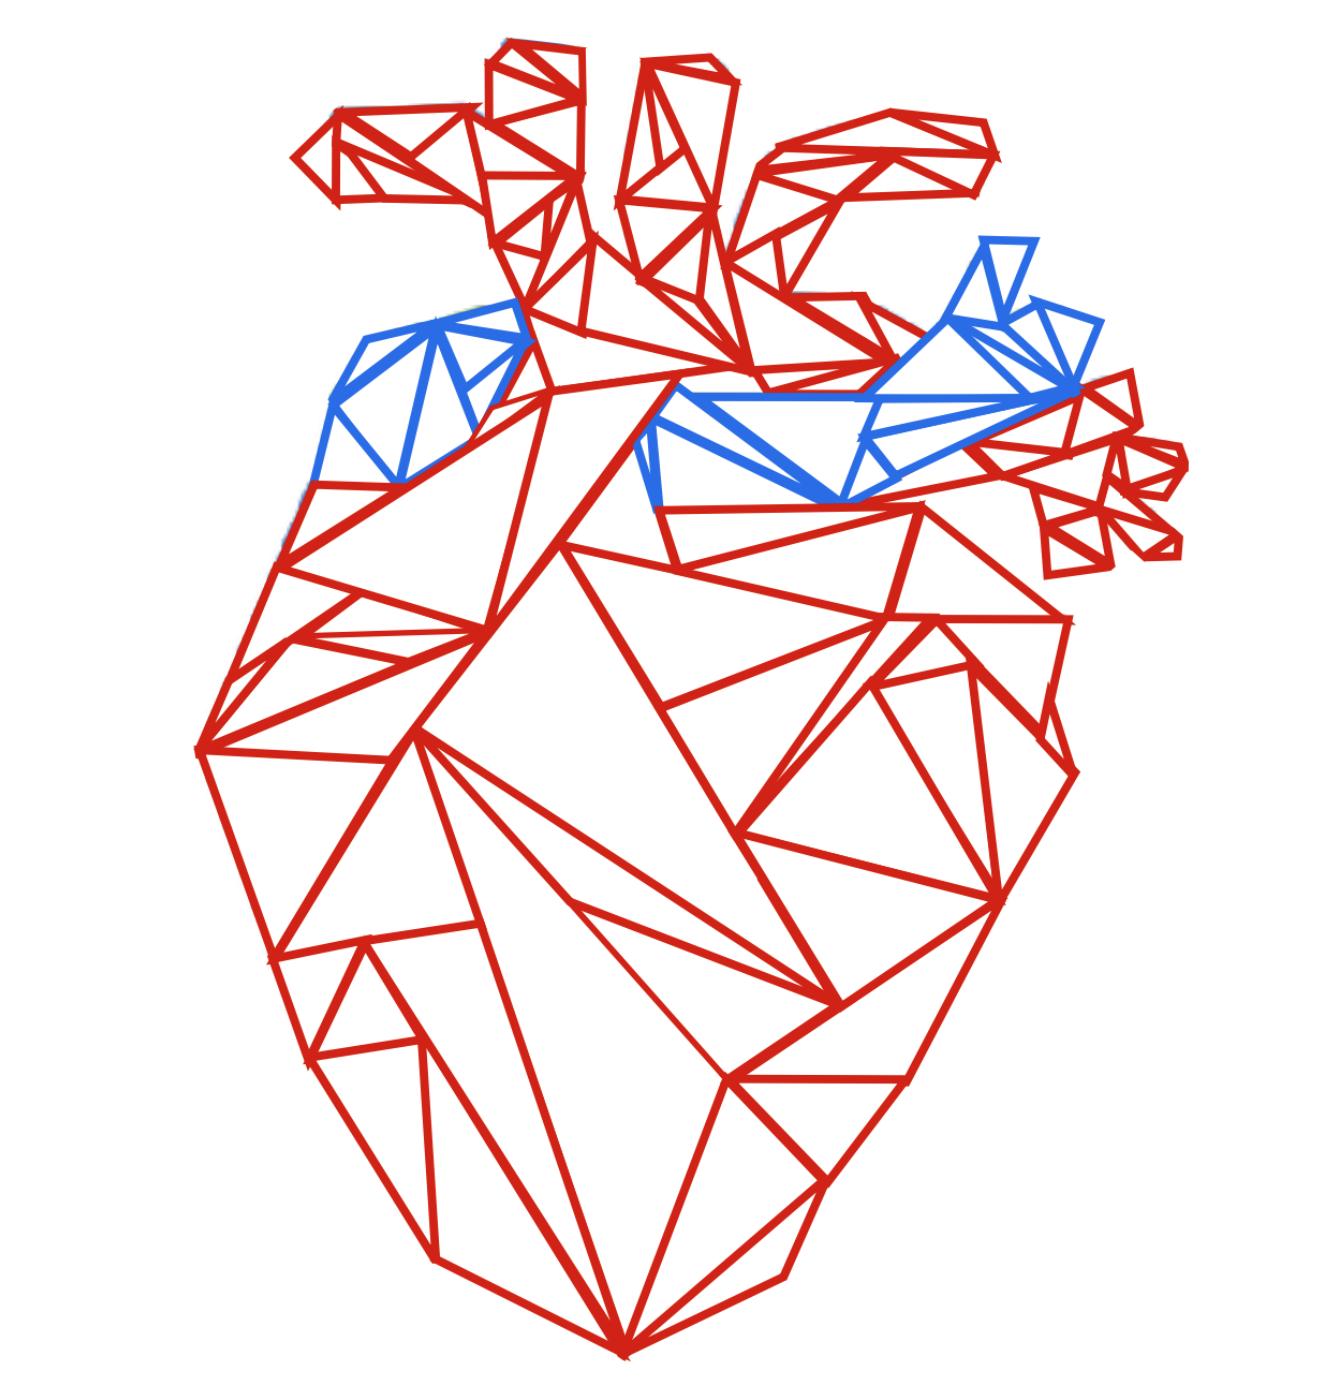 Blood And Cardiovascular System Anatomy Academy